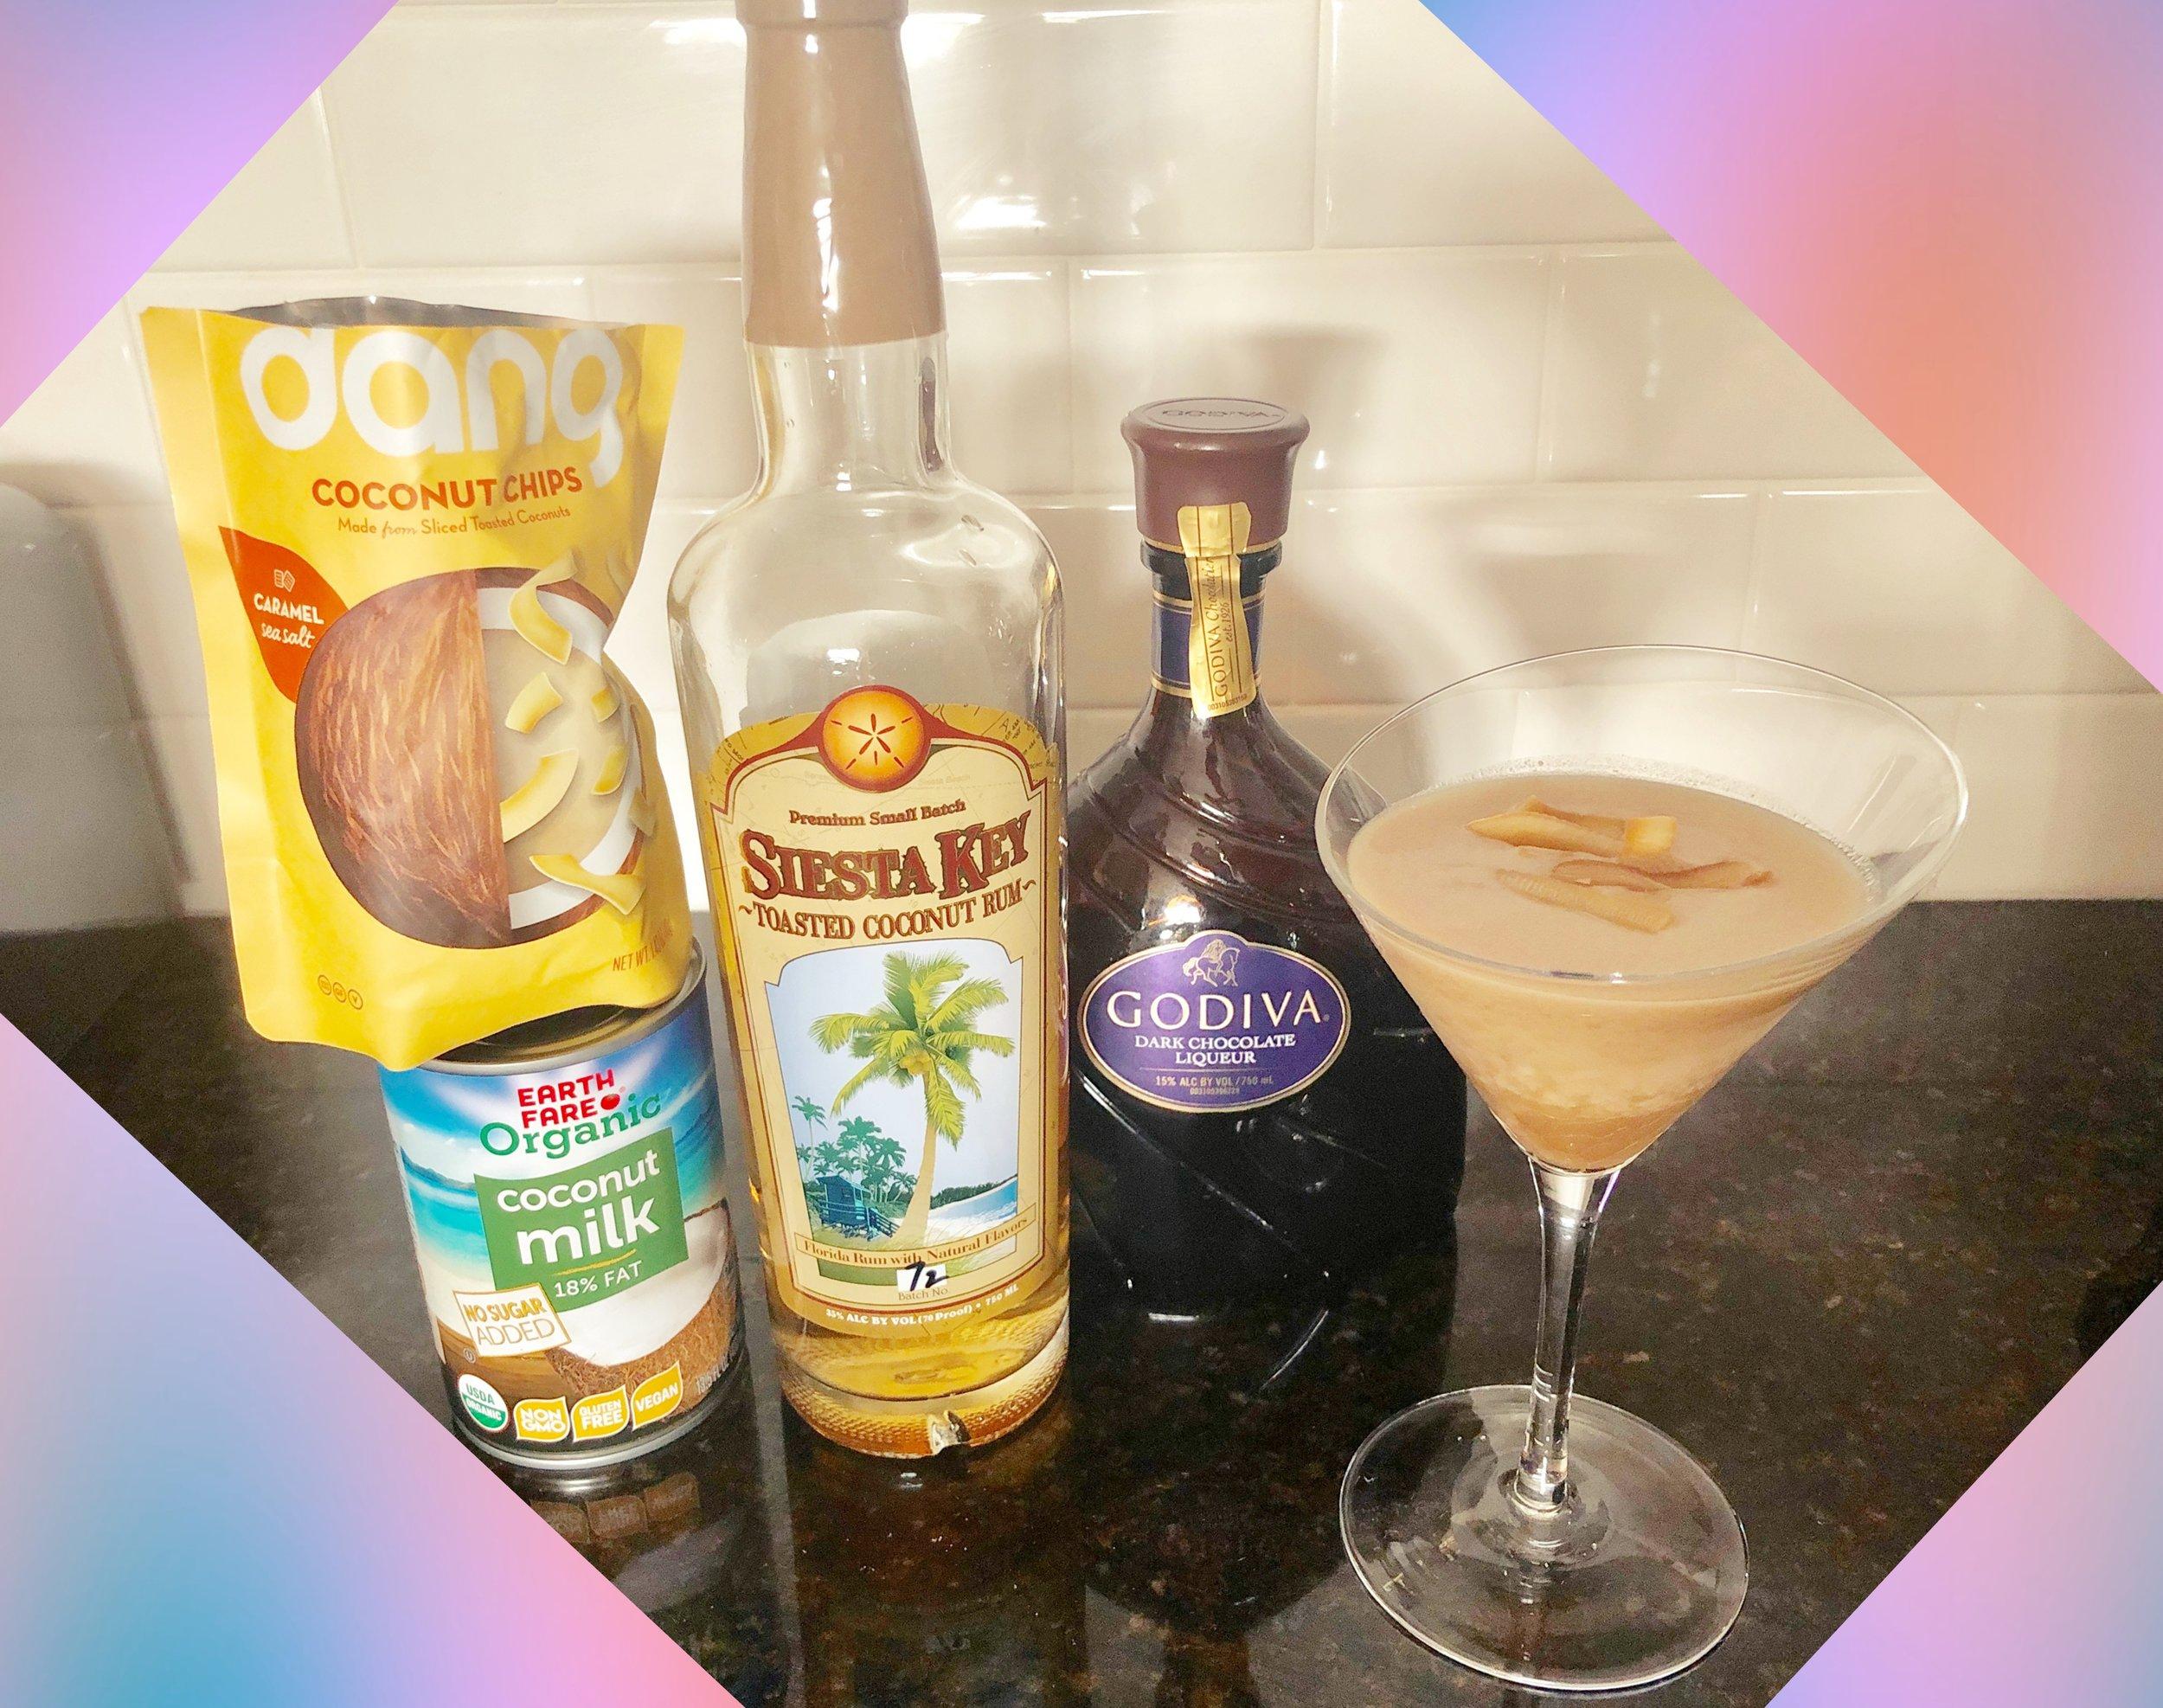 Hanukkah Menoreo Martini — Our take on a boozy, liquid Brown Bird cookie! / Handbag Marinara: A FRIENDS Podacast / @handbagmarinara